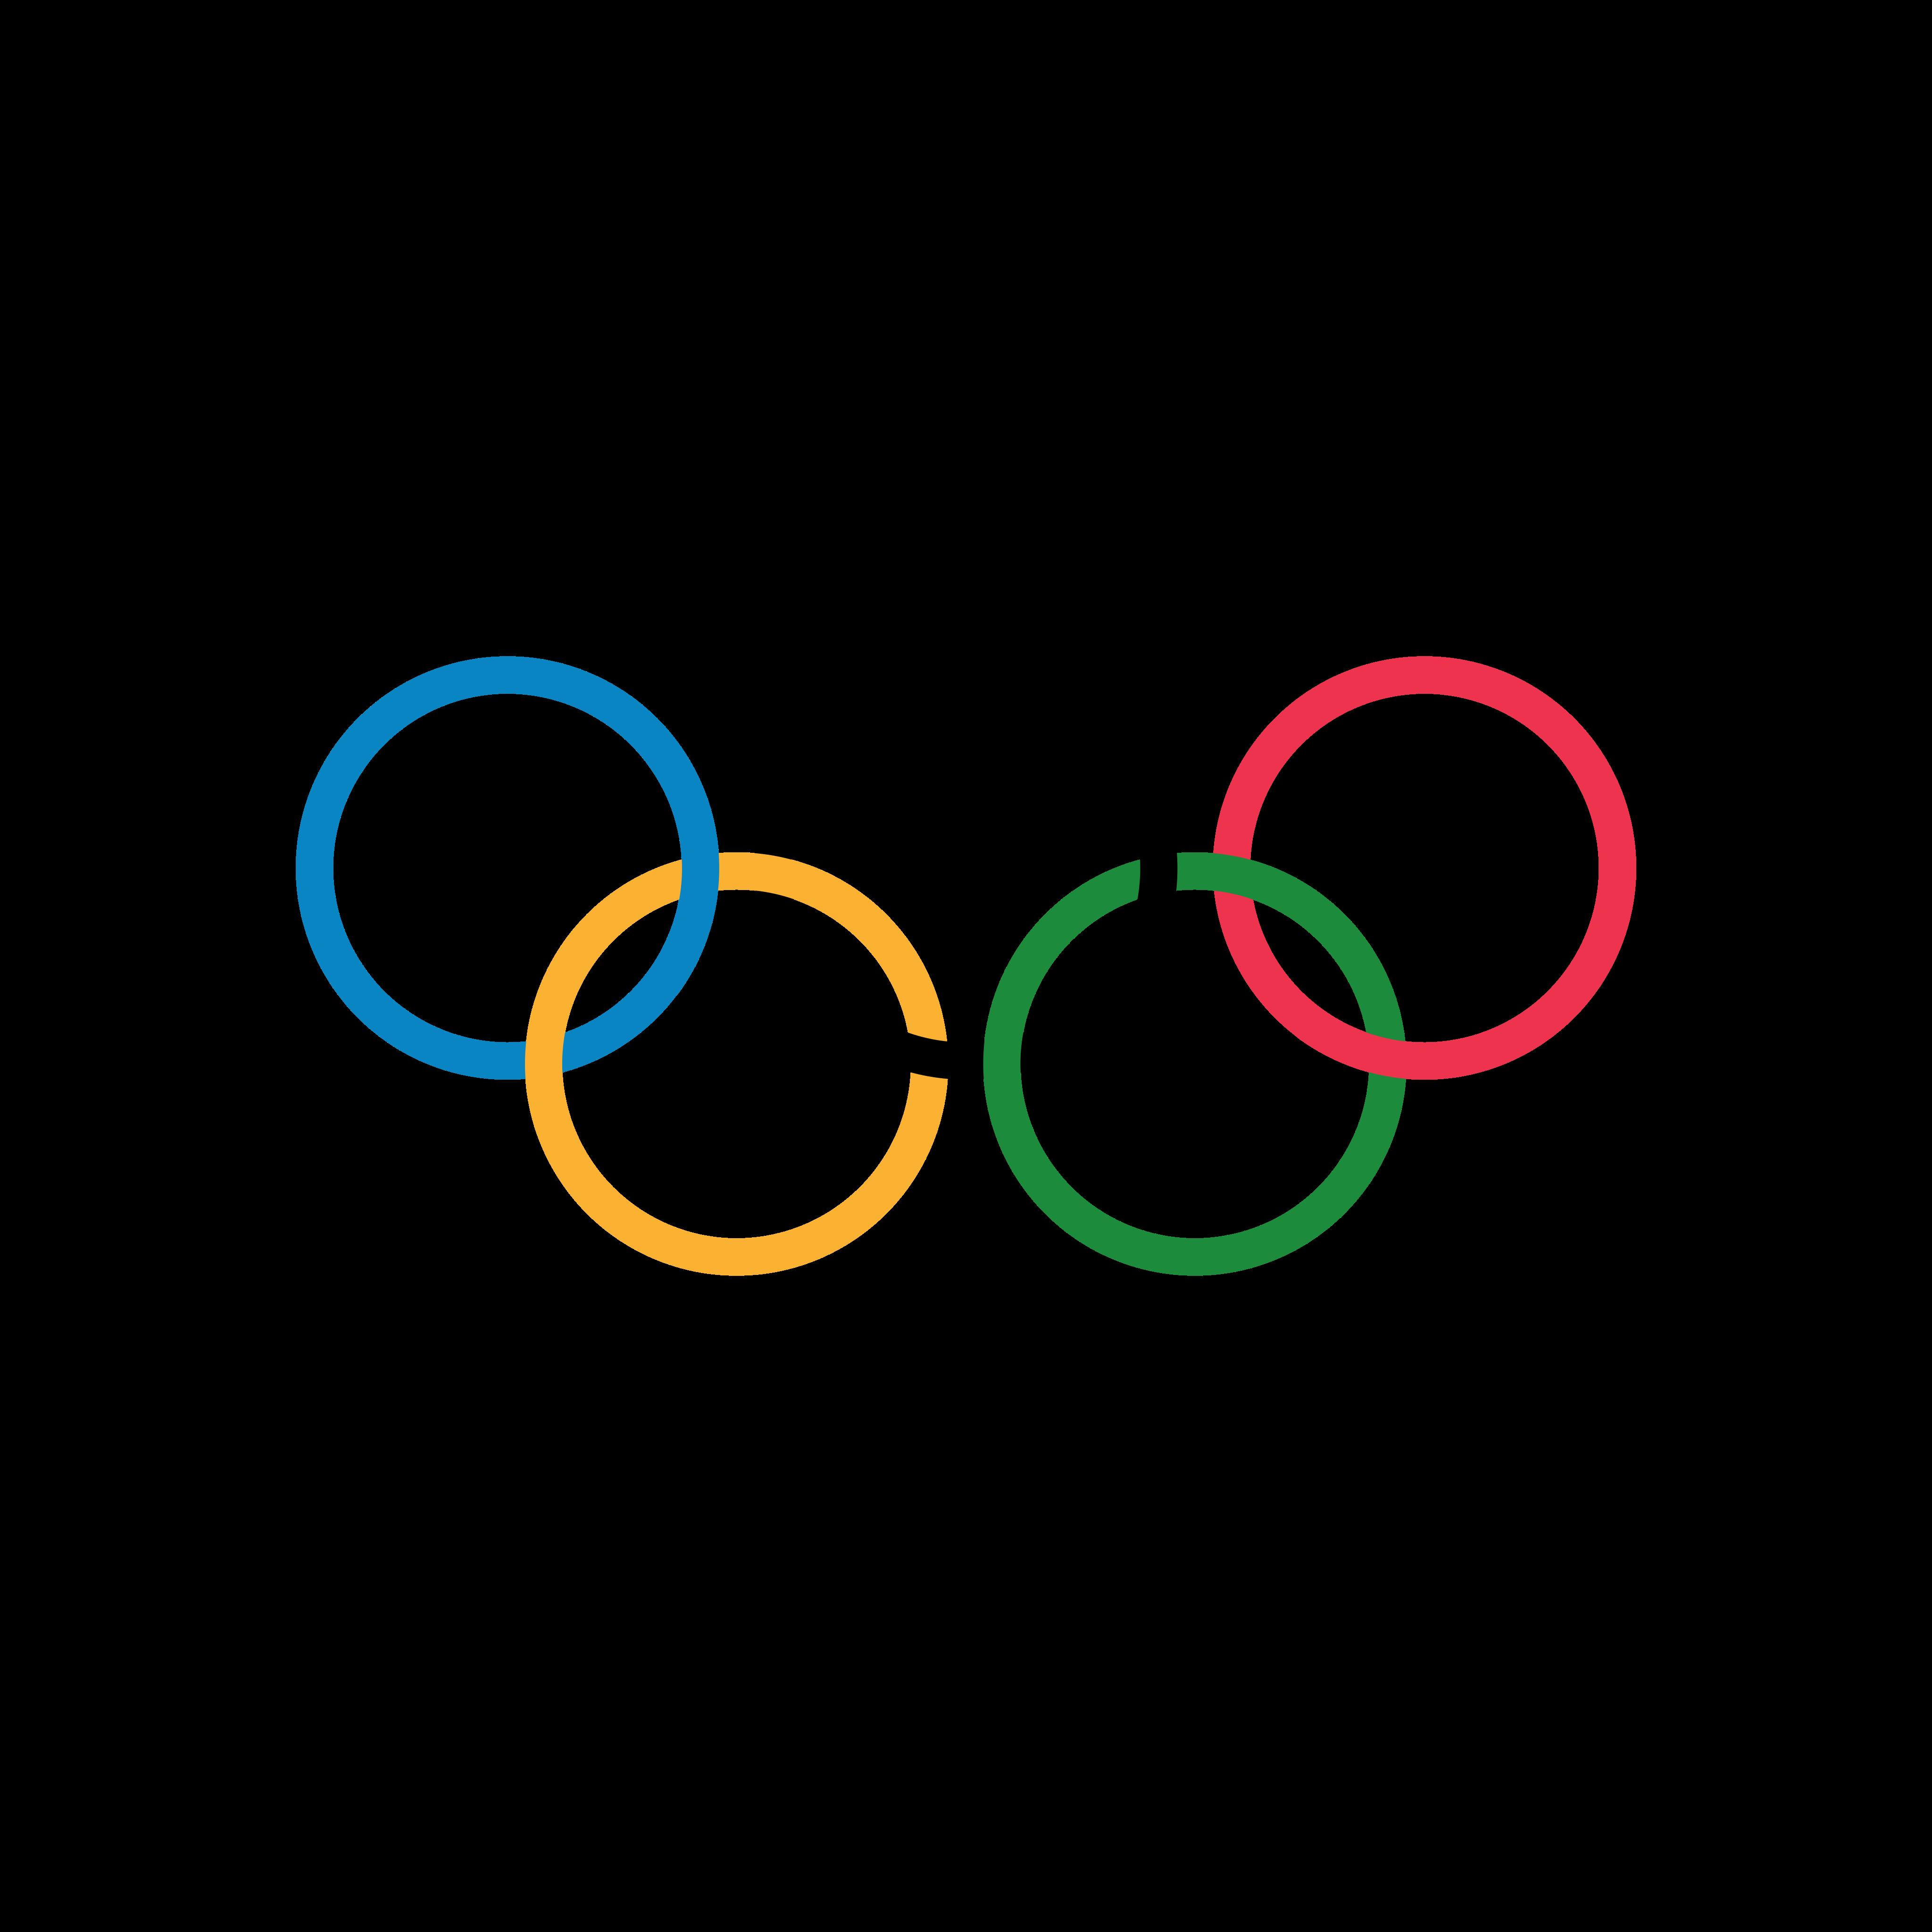 olimpiada olympic games logo 0 - Juegos Olímpicos - Olimpiada Logo